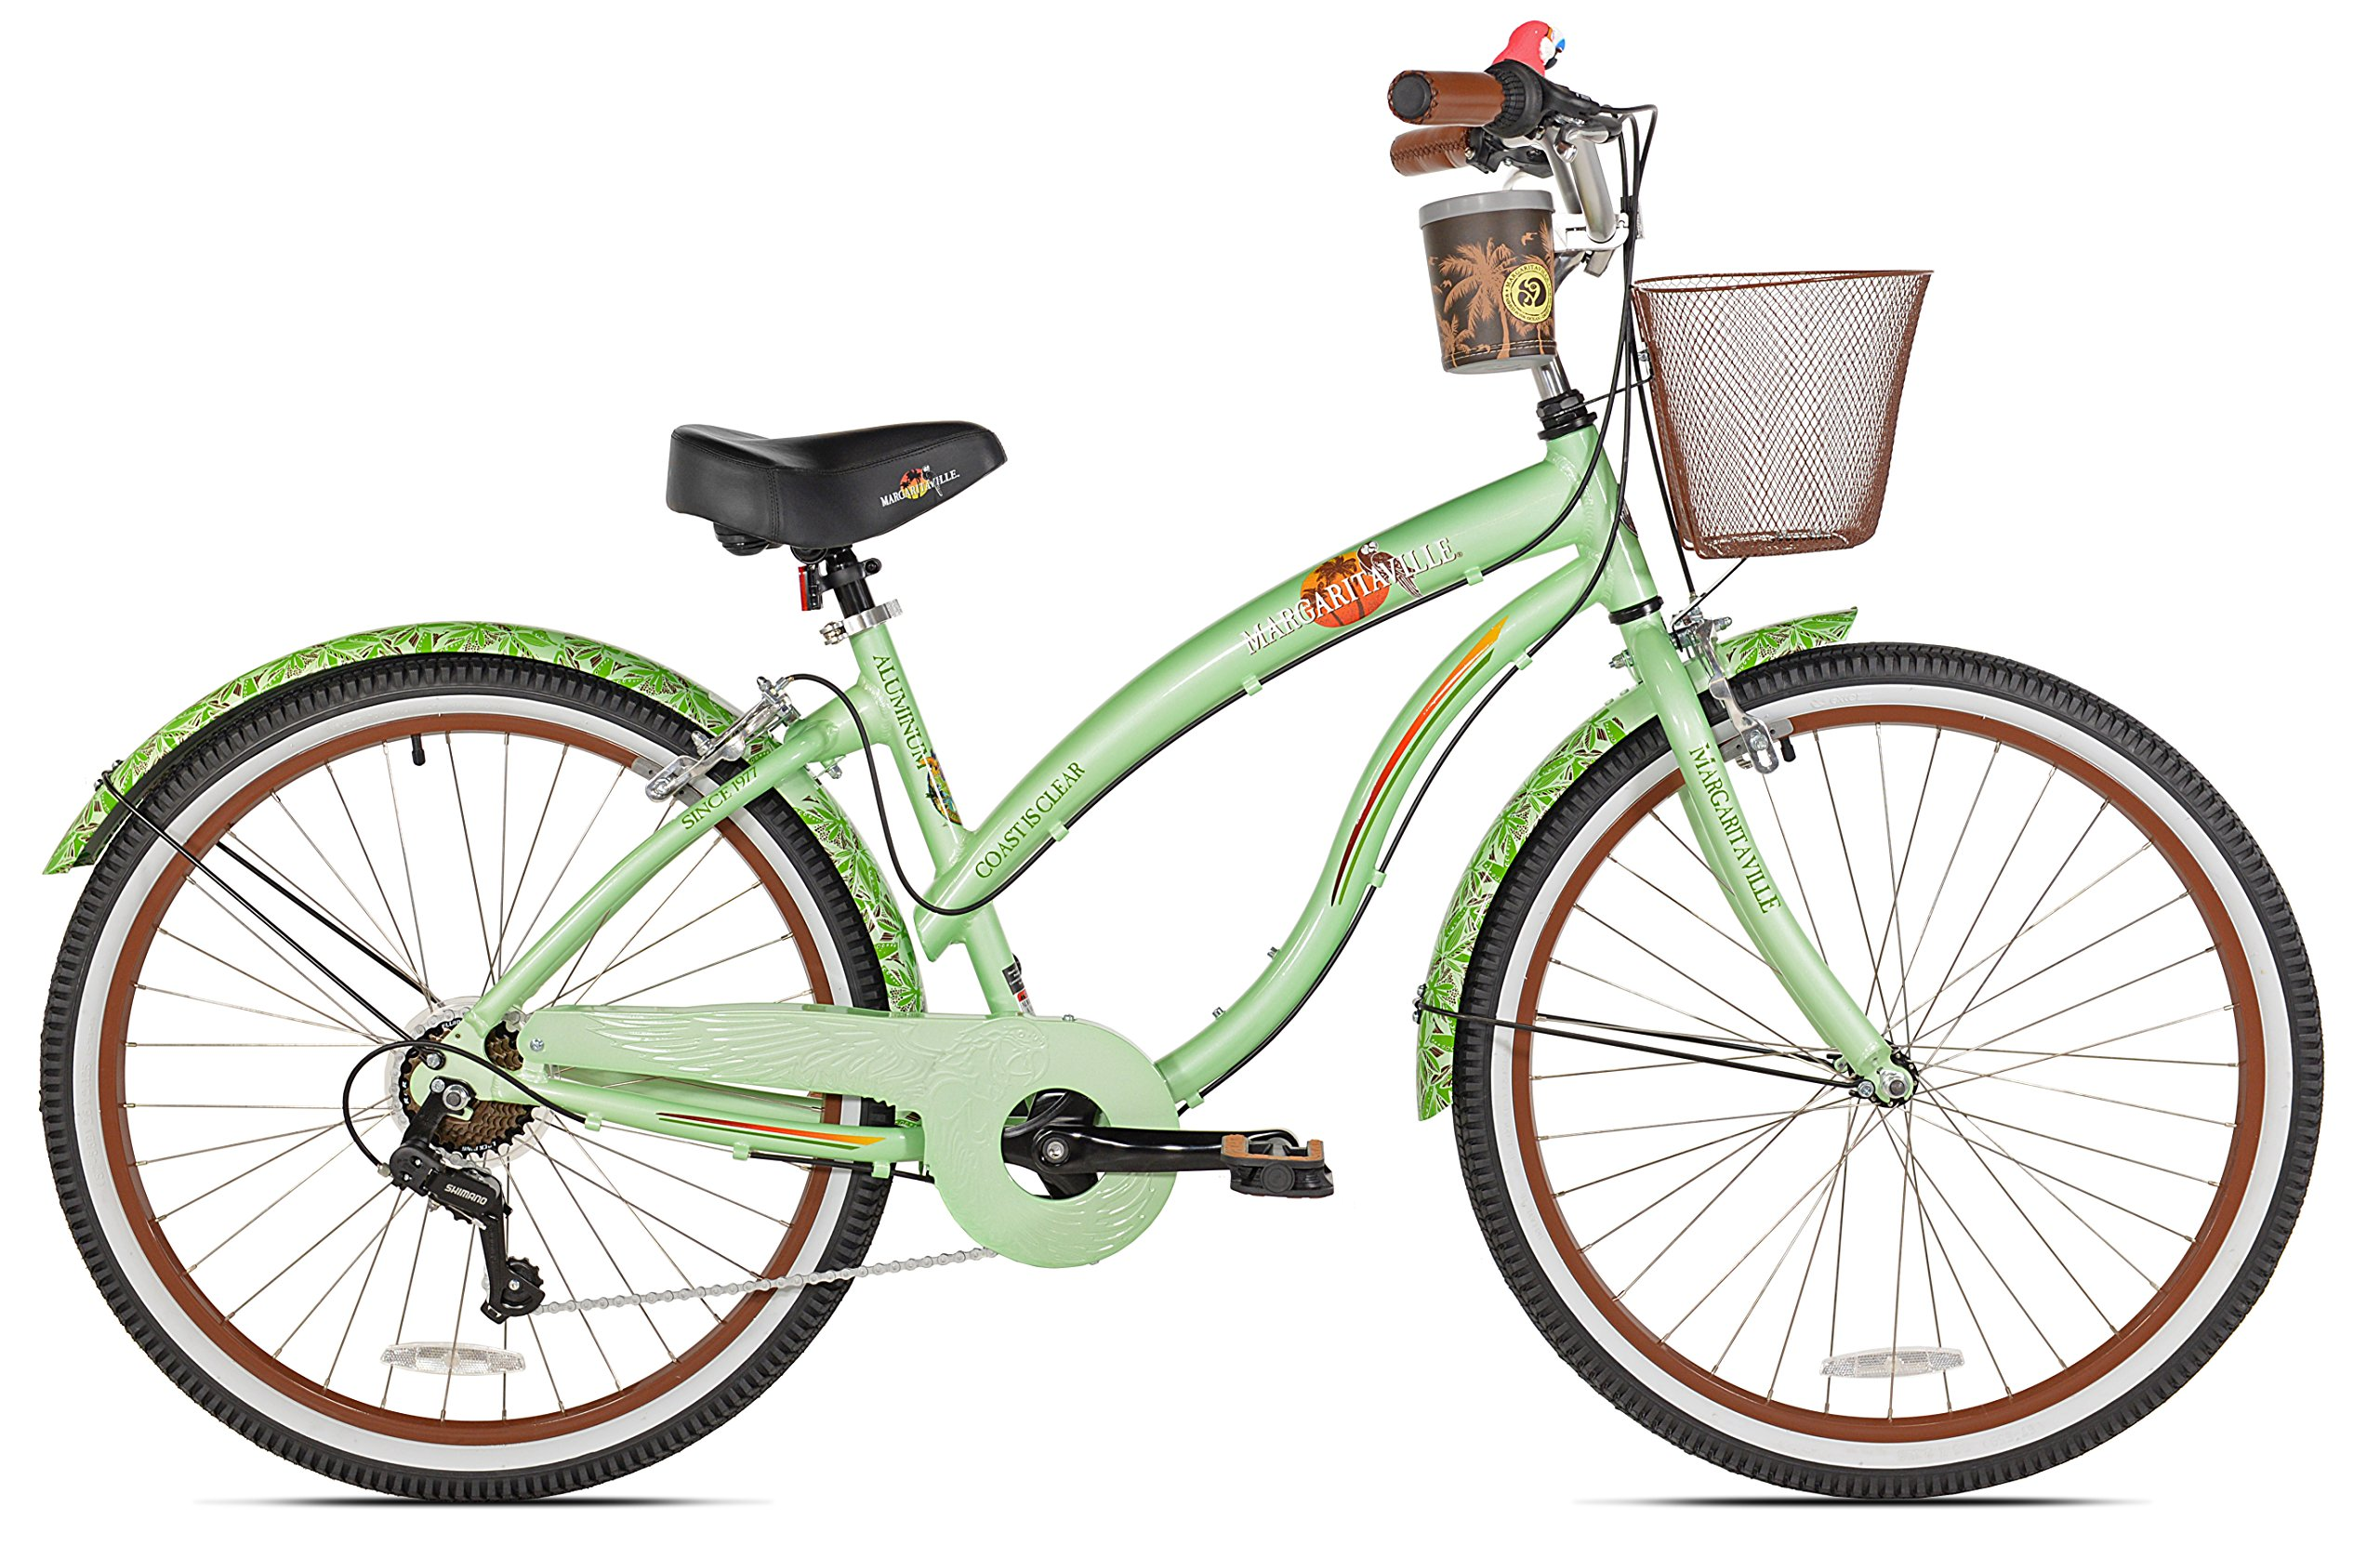 Margaritaville Coast Is Clear Women's Beach Cruiser Bike, 26-Inch by Margaritaville (Image #2)